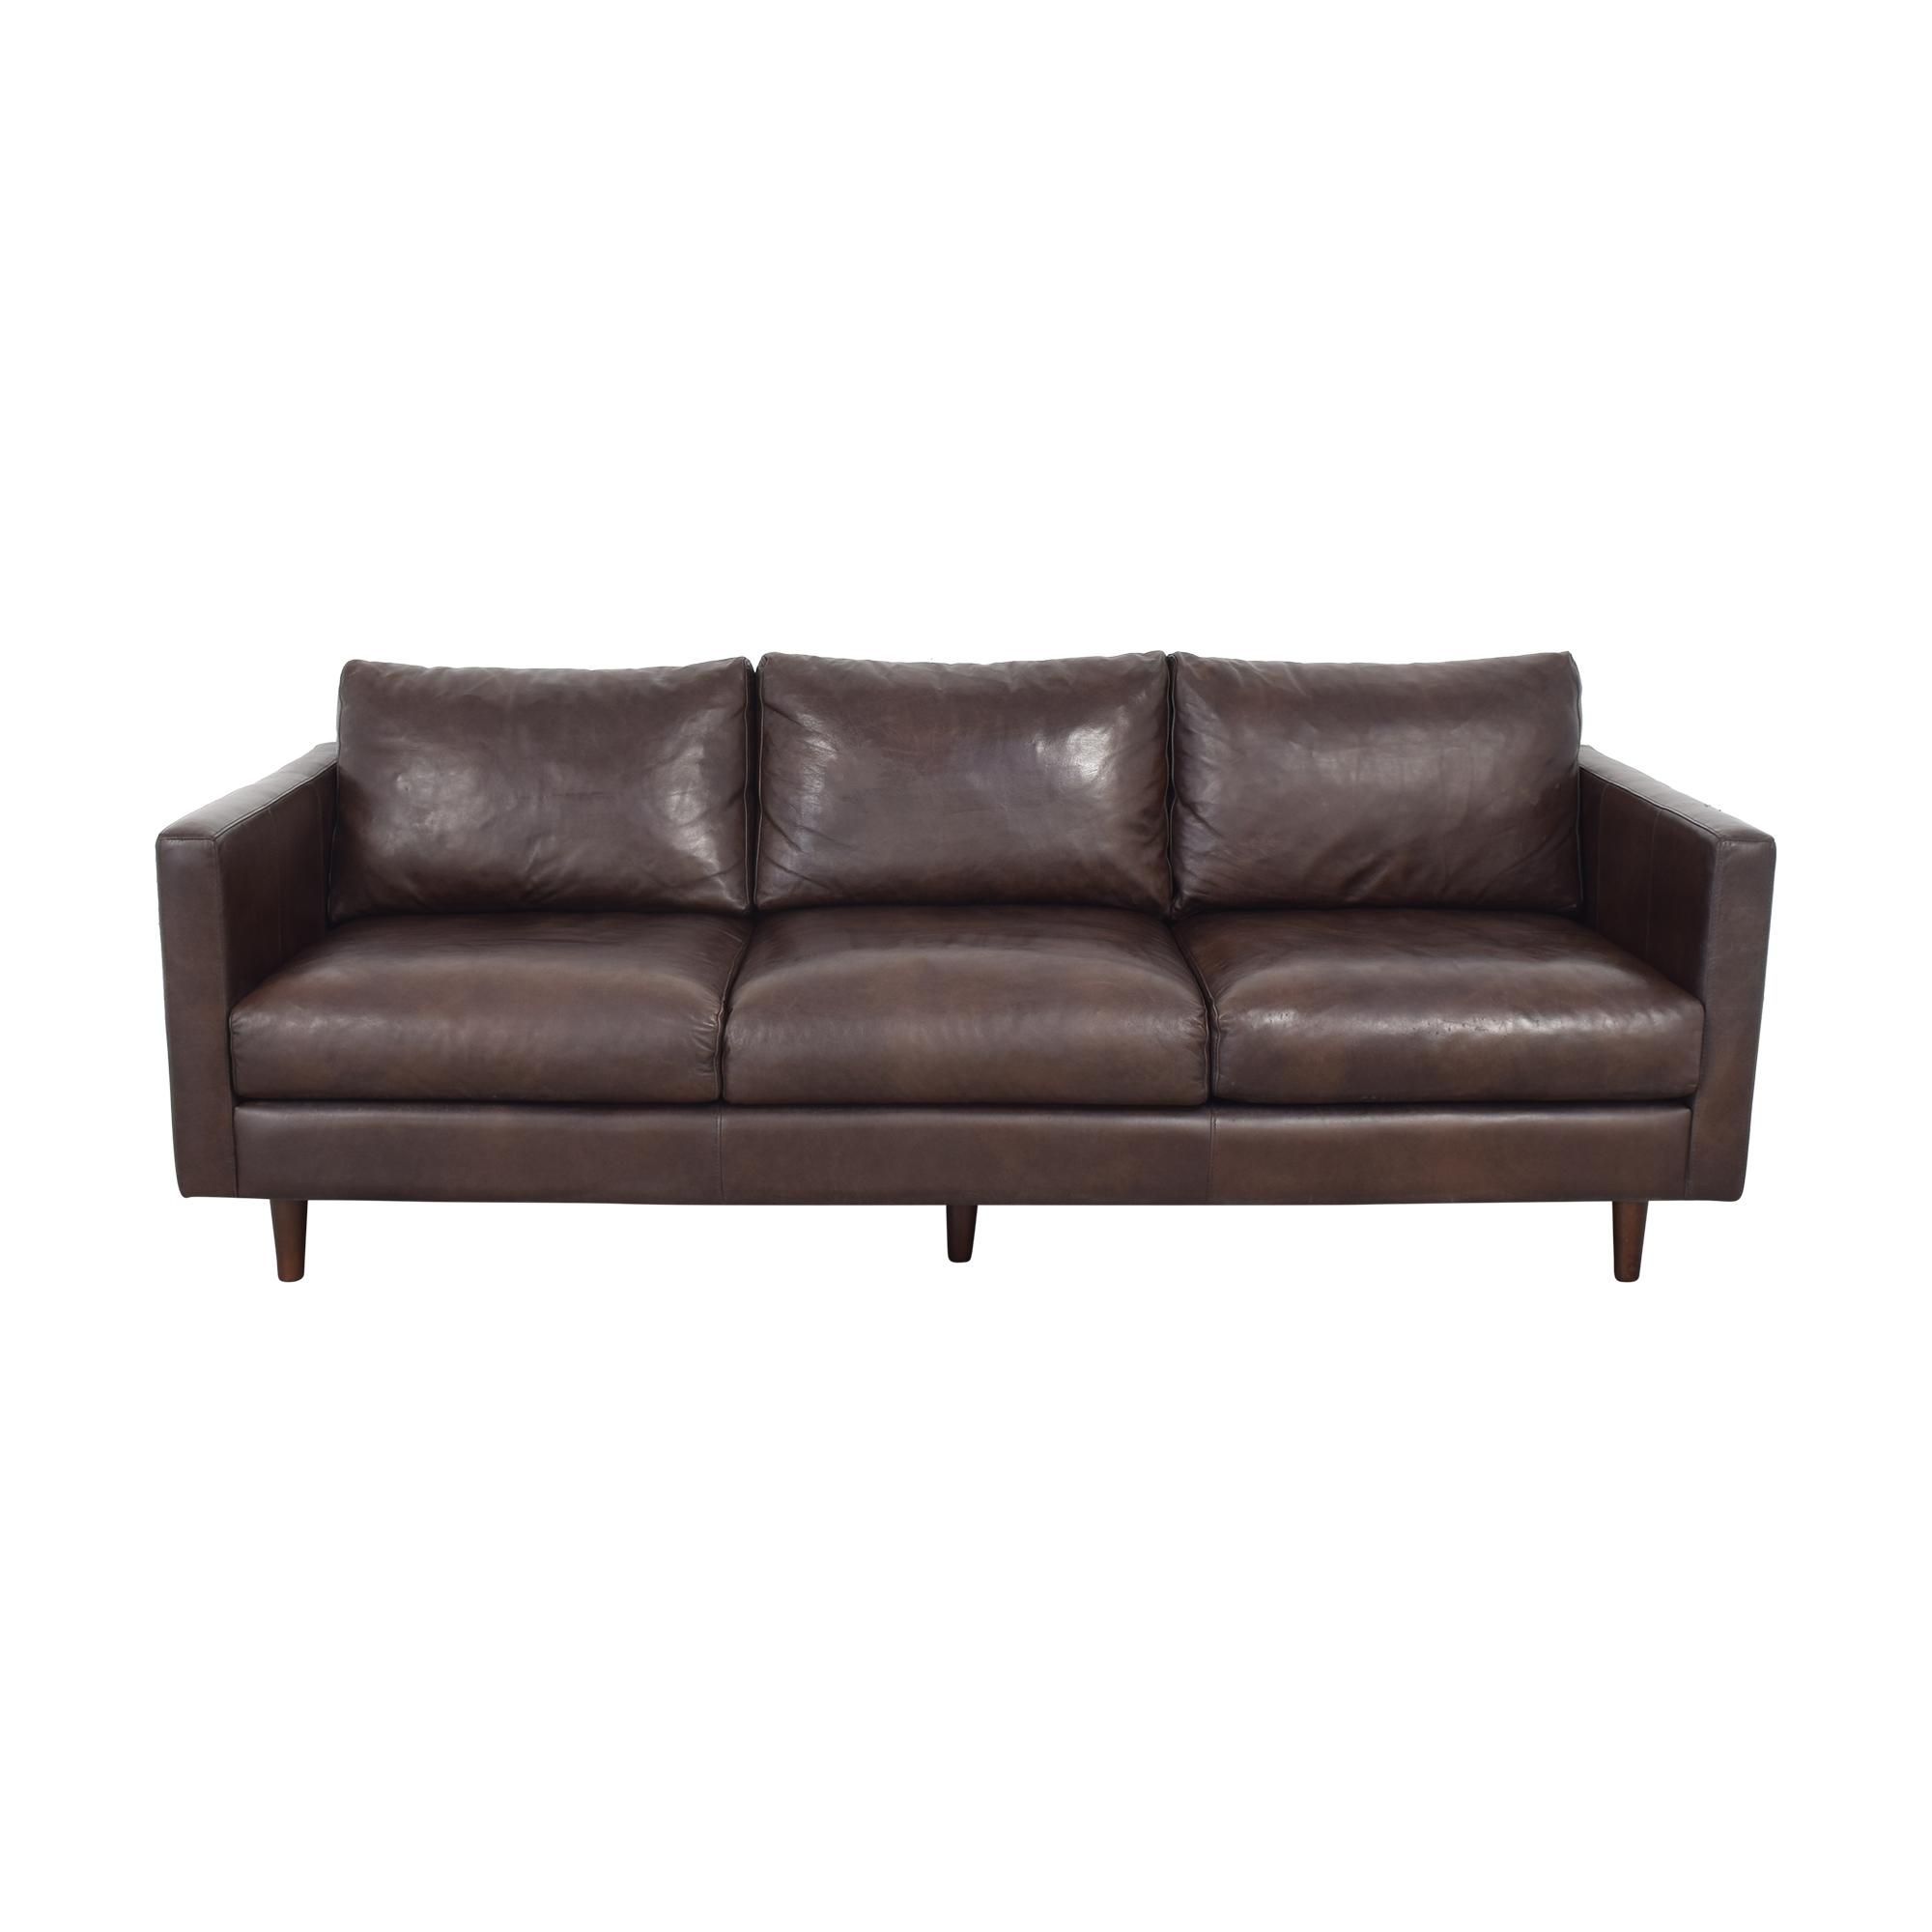 Strick & Bolton Strick & Bolton Beatnik Oxford Brown Leather Sofa ct